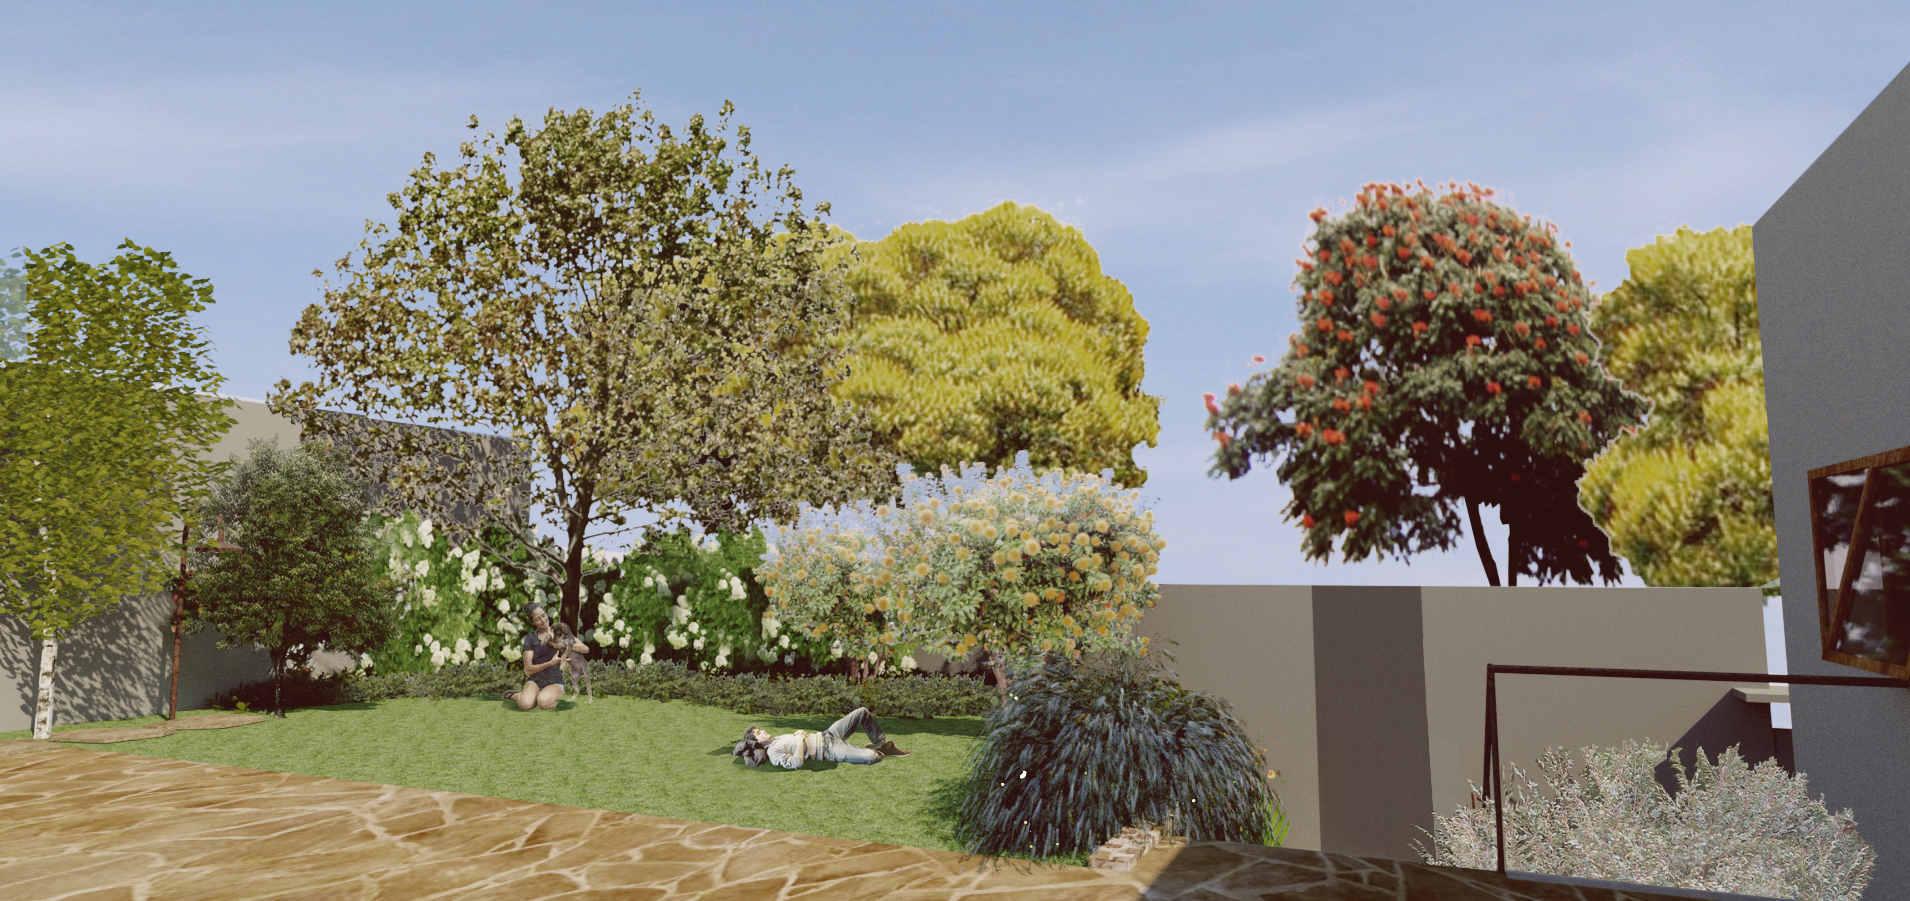 ilustração jardim da frente